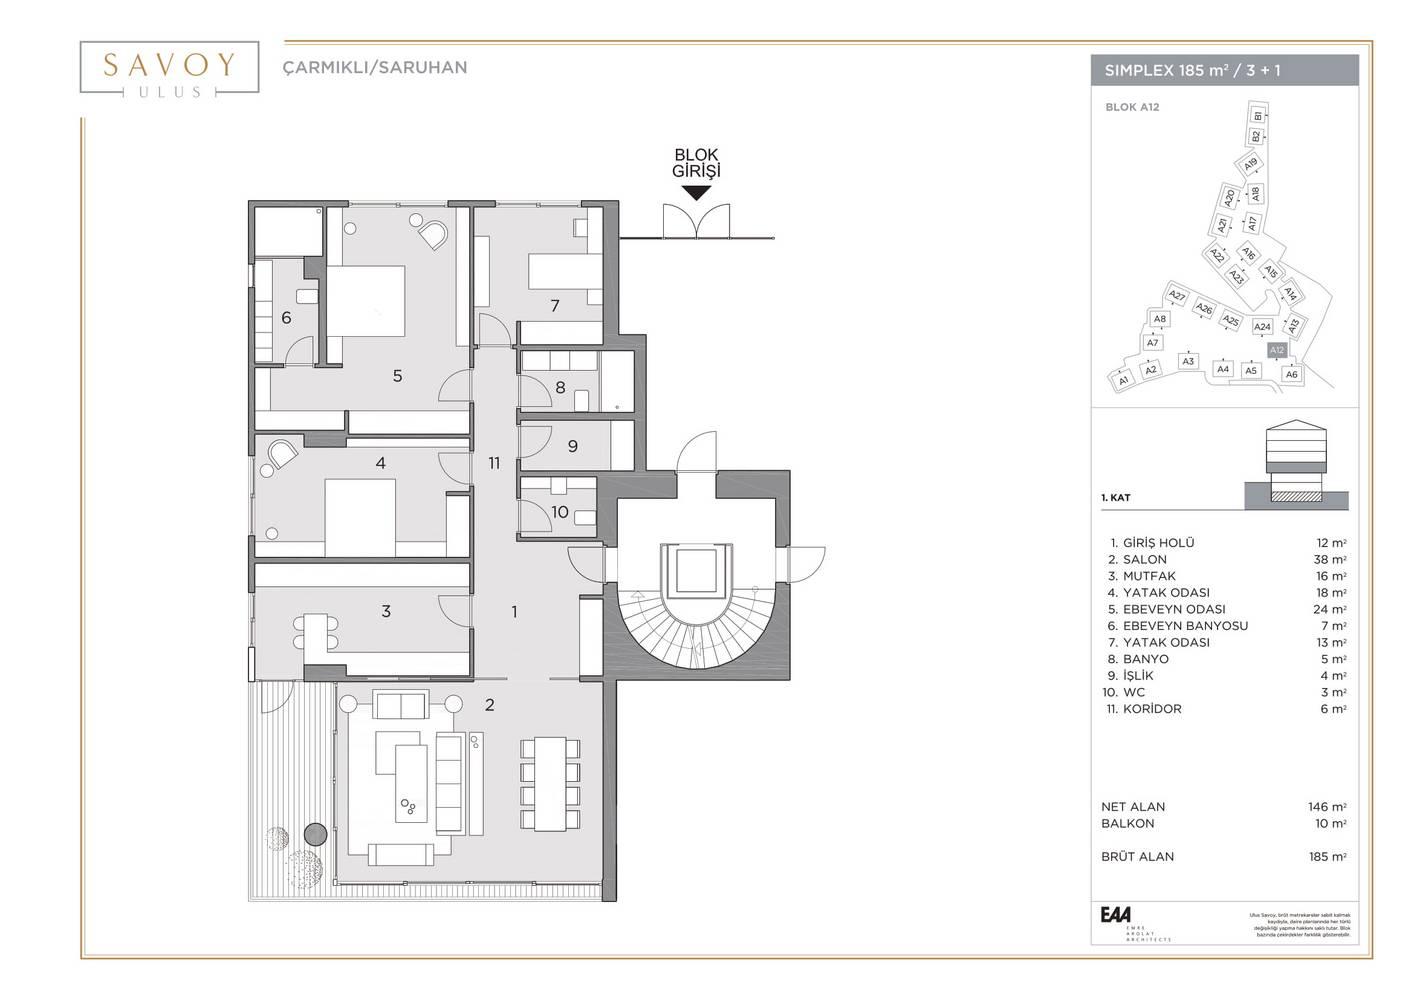 Savoy Residence S185